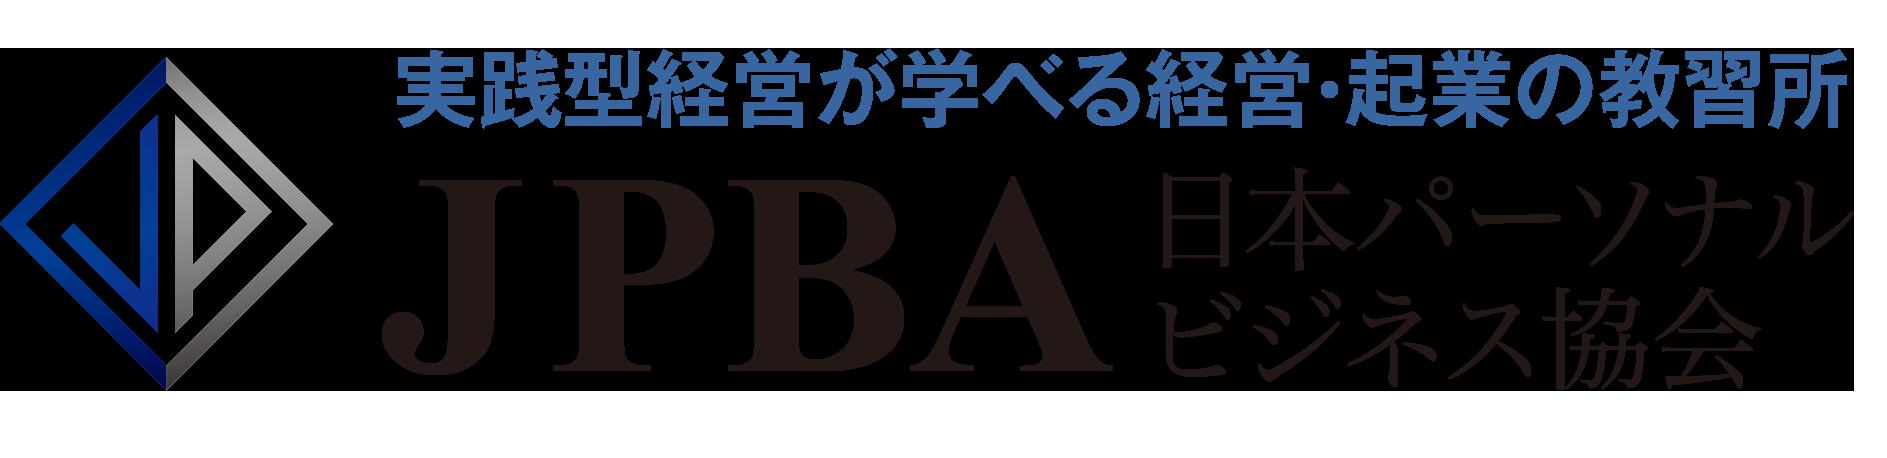 |JPBA|一般社団法人日本パーソナルビジネス協会|基礎から経営を学ぼう!